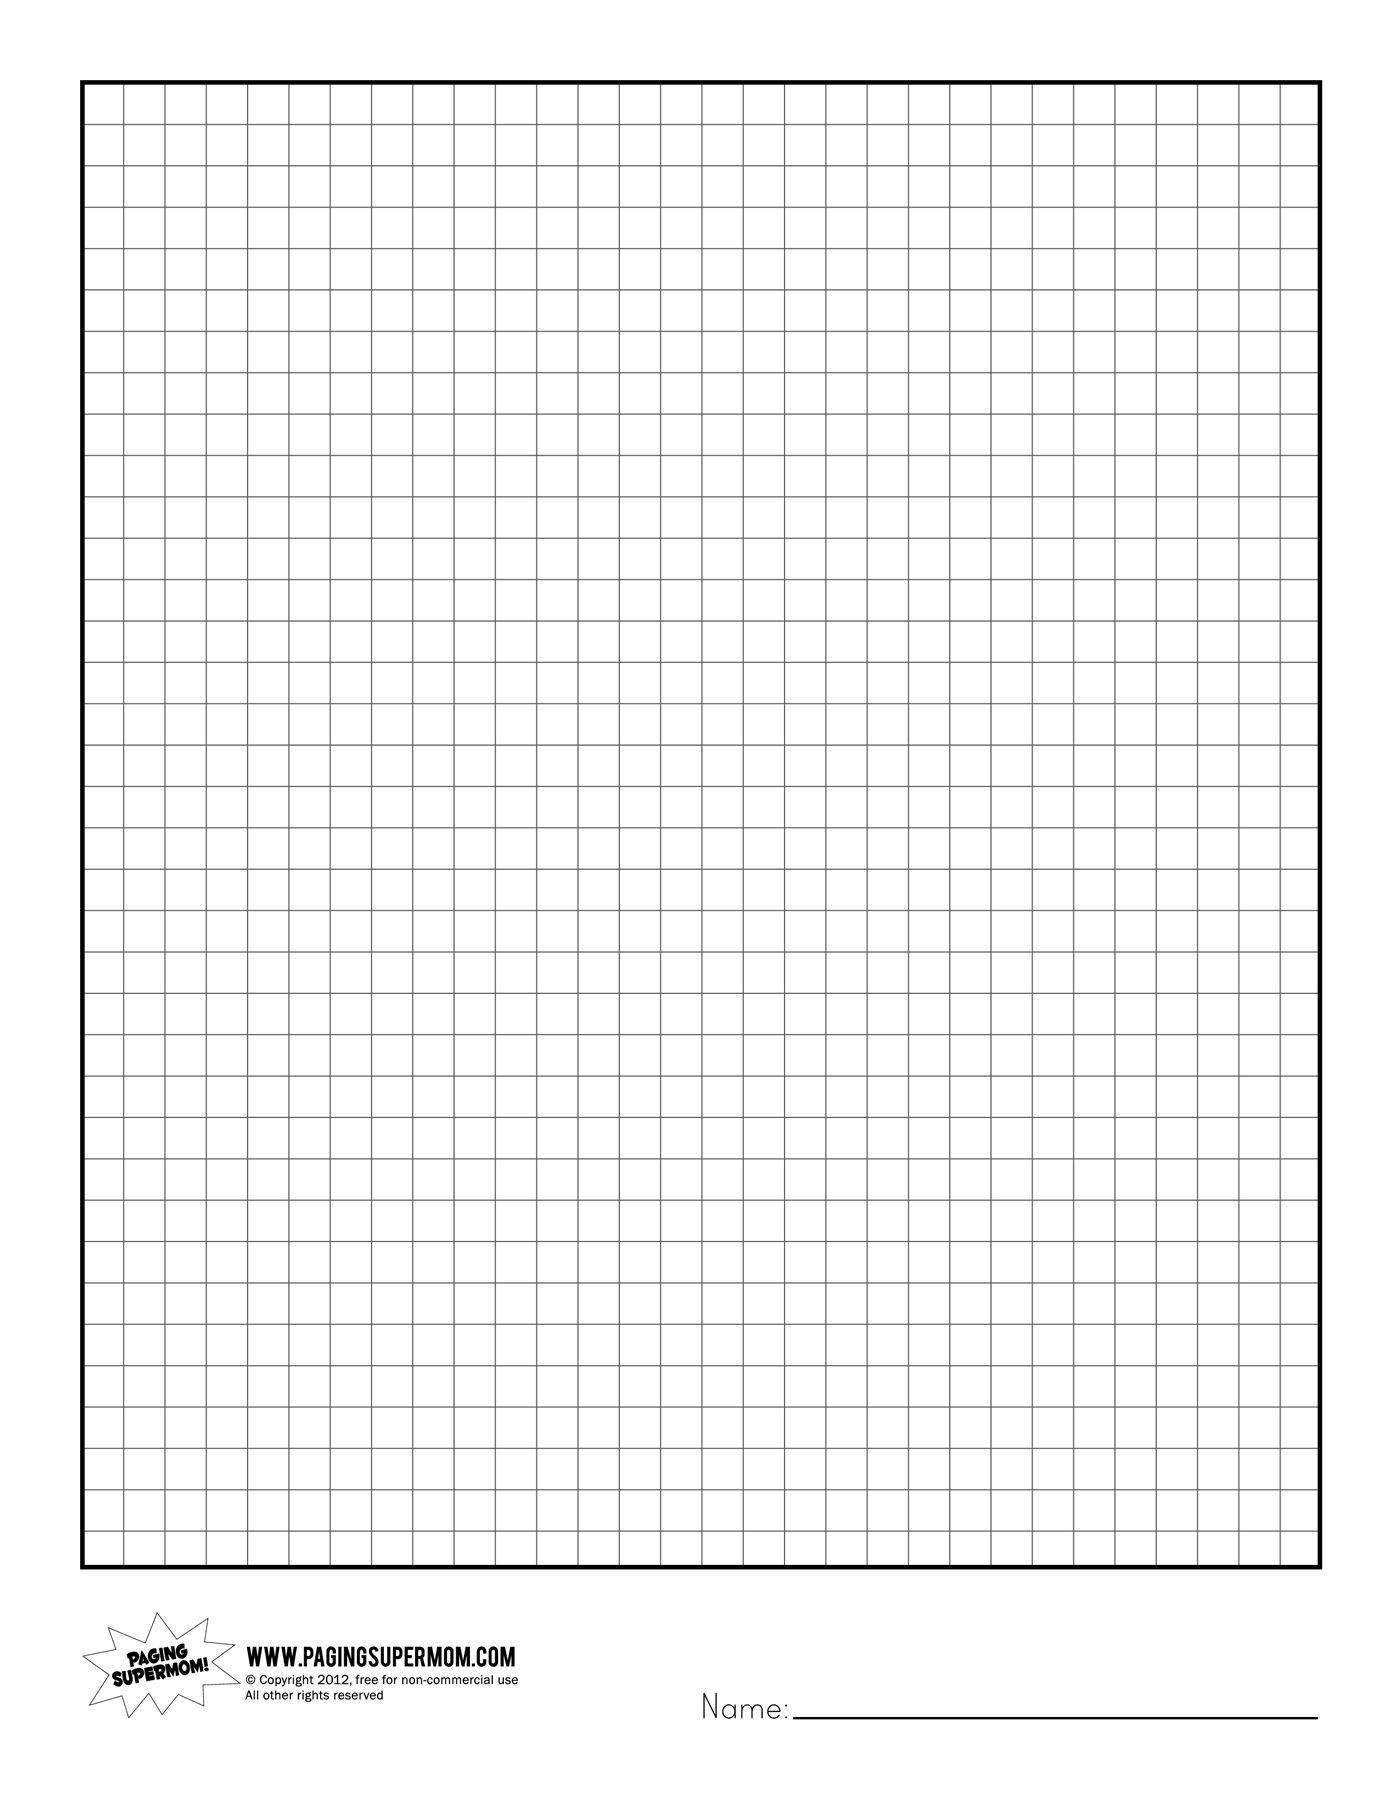 Printable Graph Paper | Healthy Eating | Printable Graph Paper, Grid - Free Printable Grid Paper